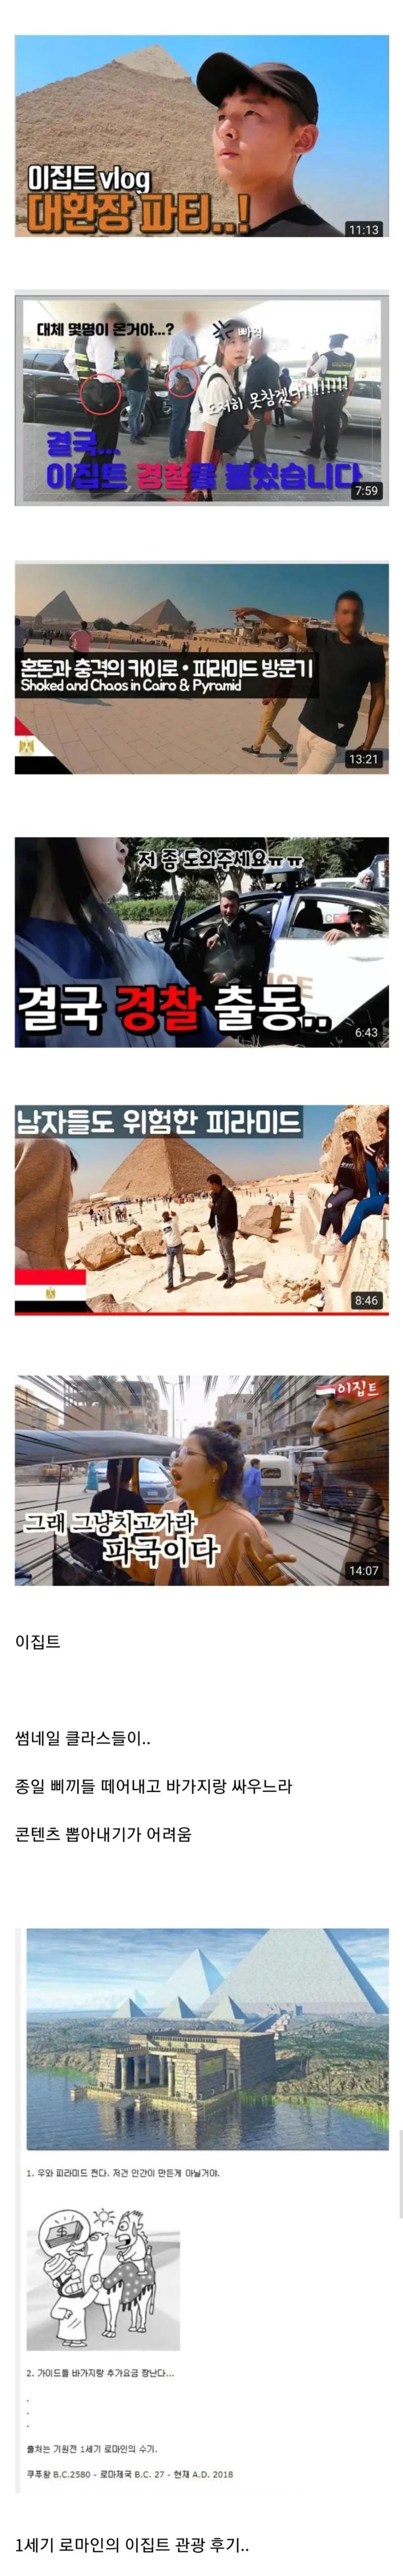 image.png 해외 여행 유튜버들의 무덤